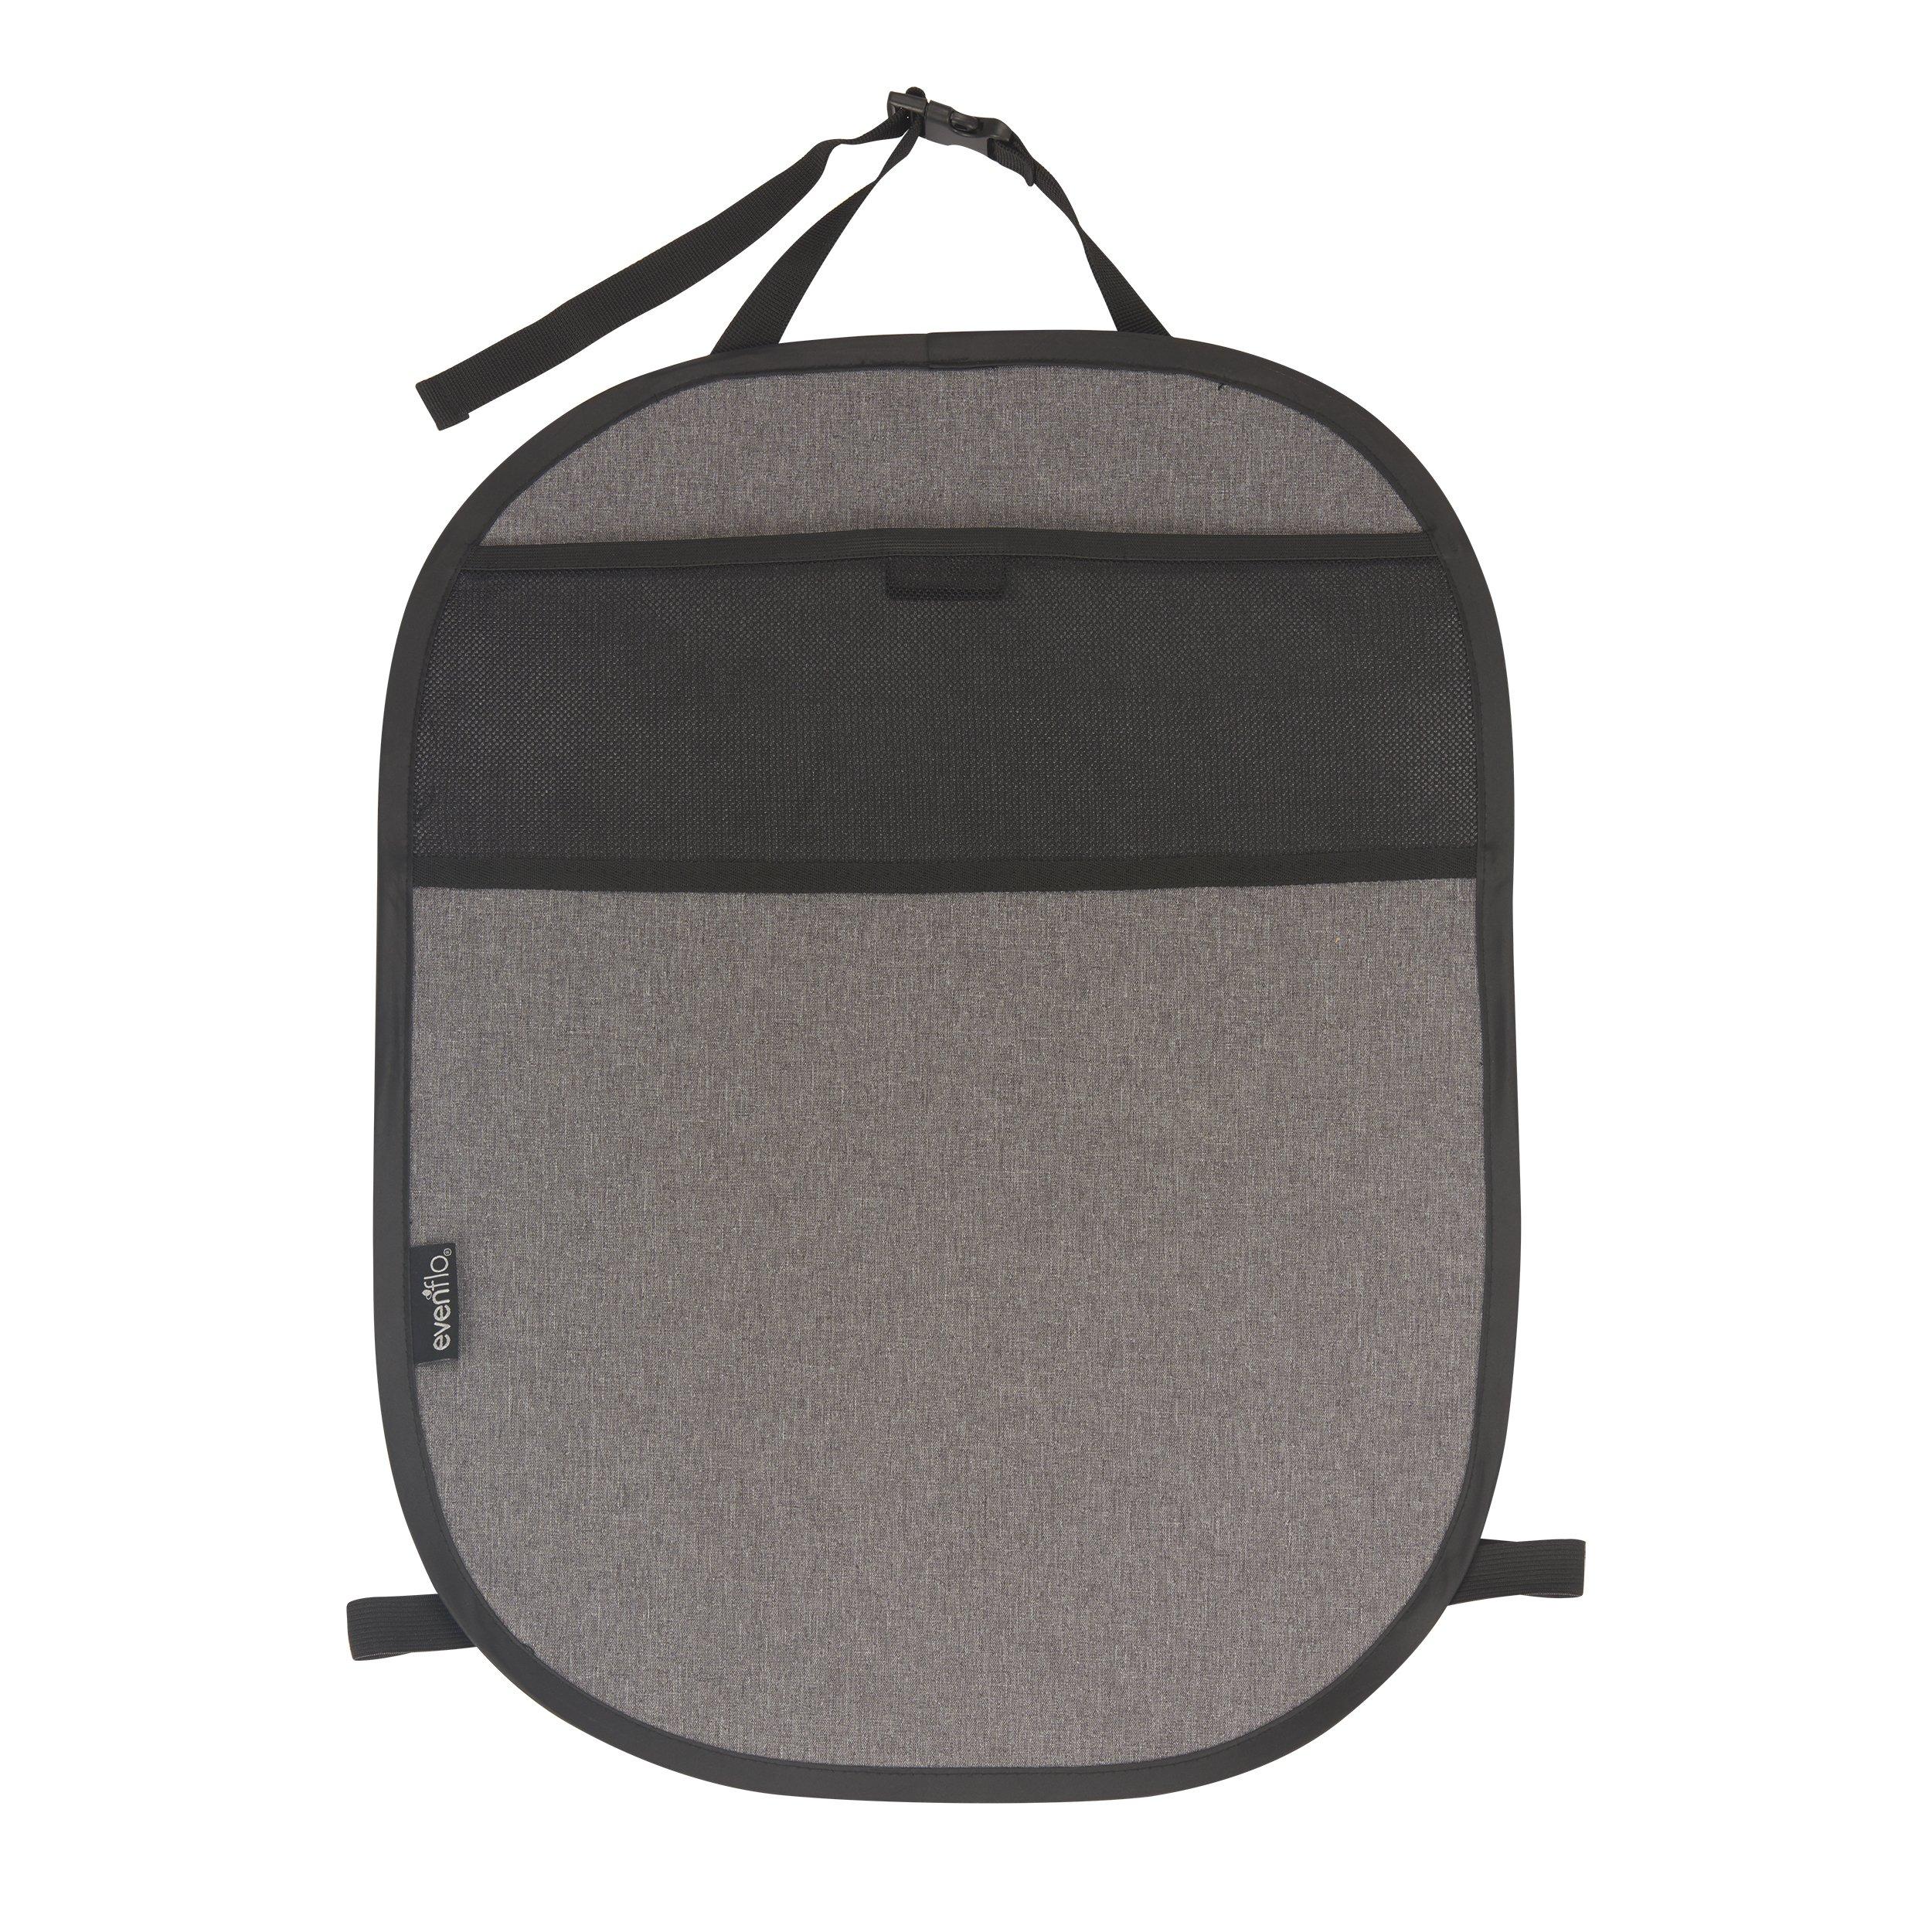 Evenflo Car Seat Kick Mat With Storage Pocket Black